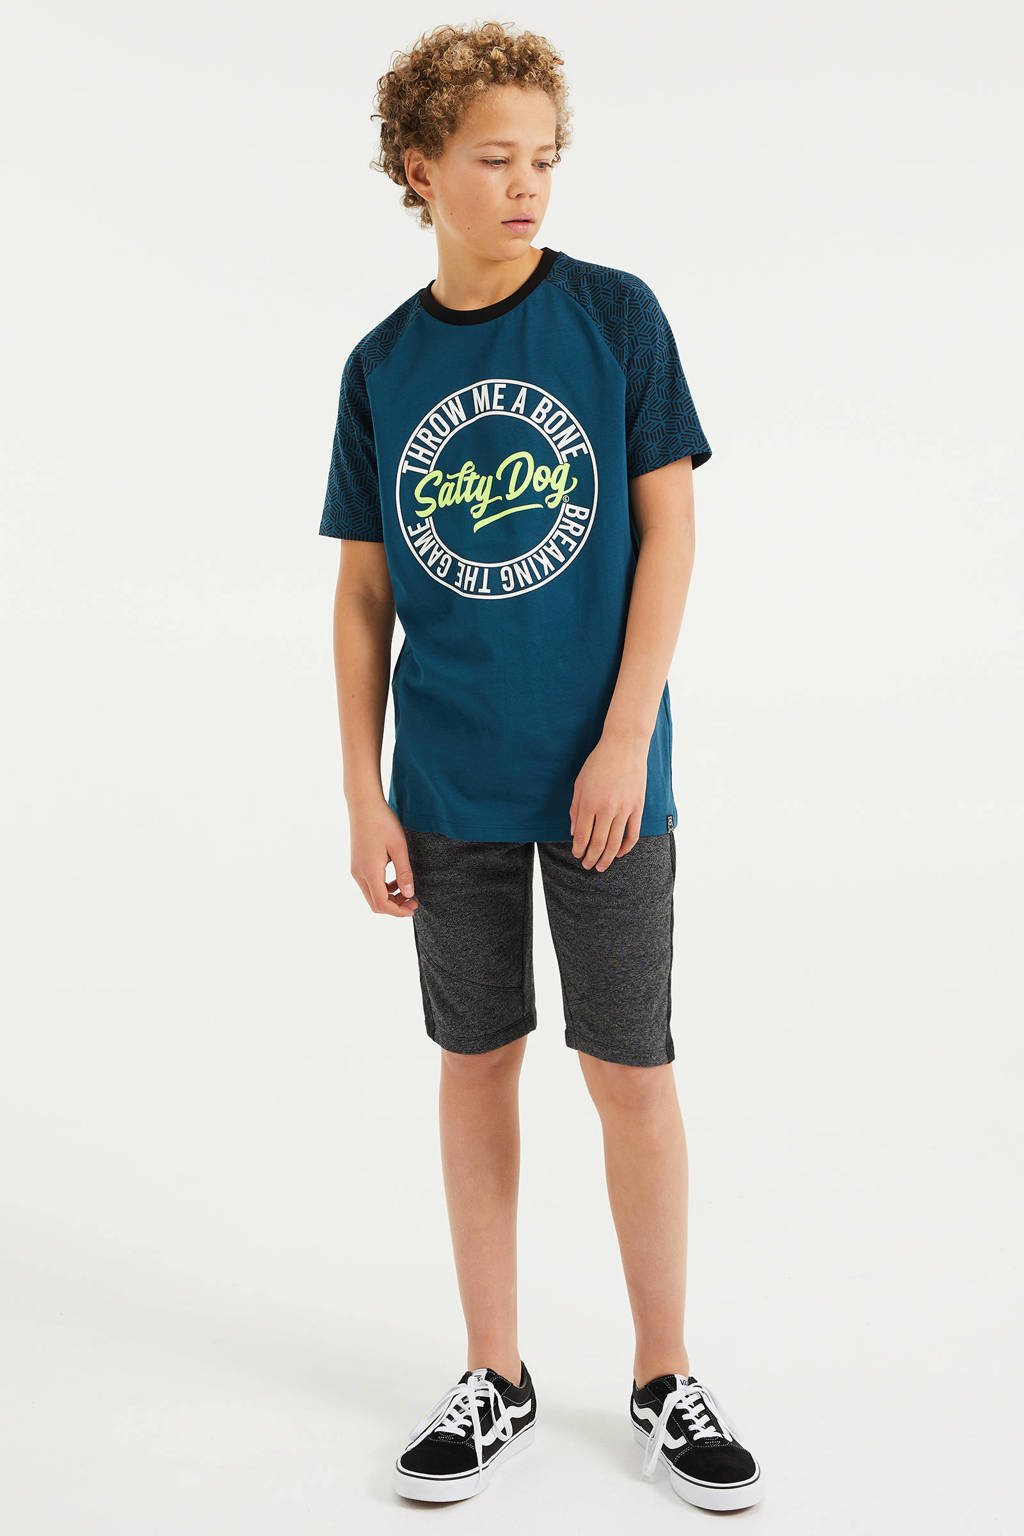 WE Fashion Salty Dog T-shirt met tekst petrol/groen/wit, Petrol/groen/wit